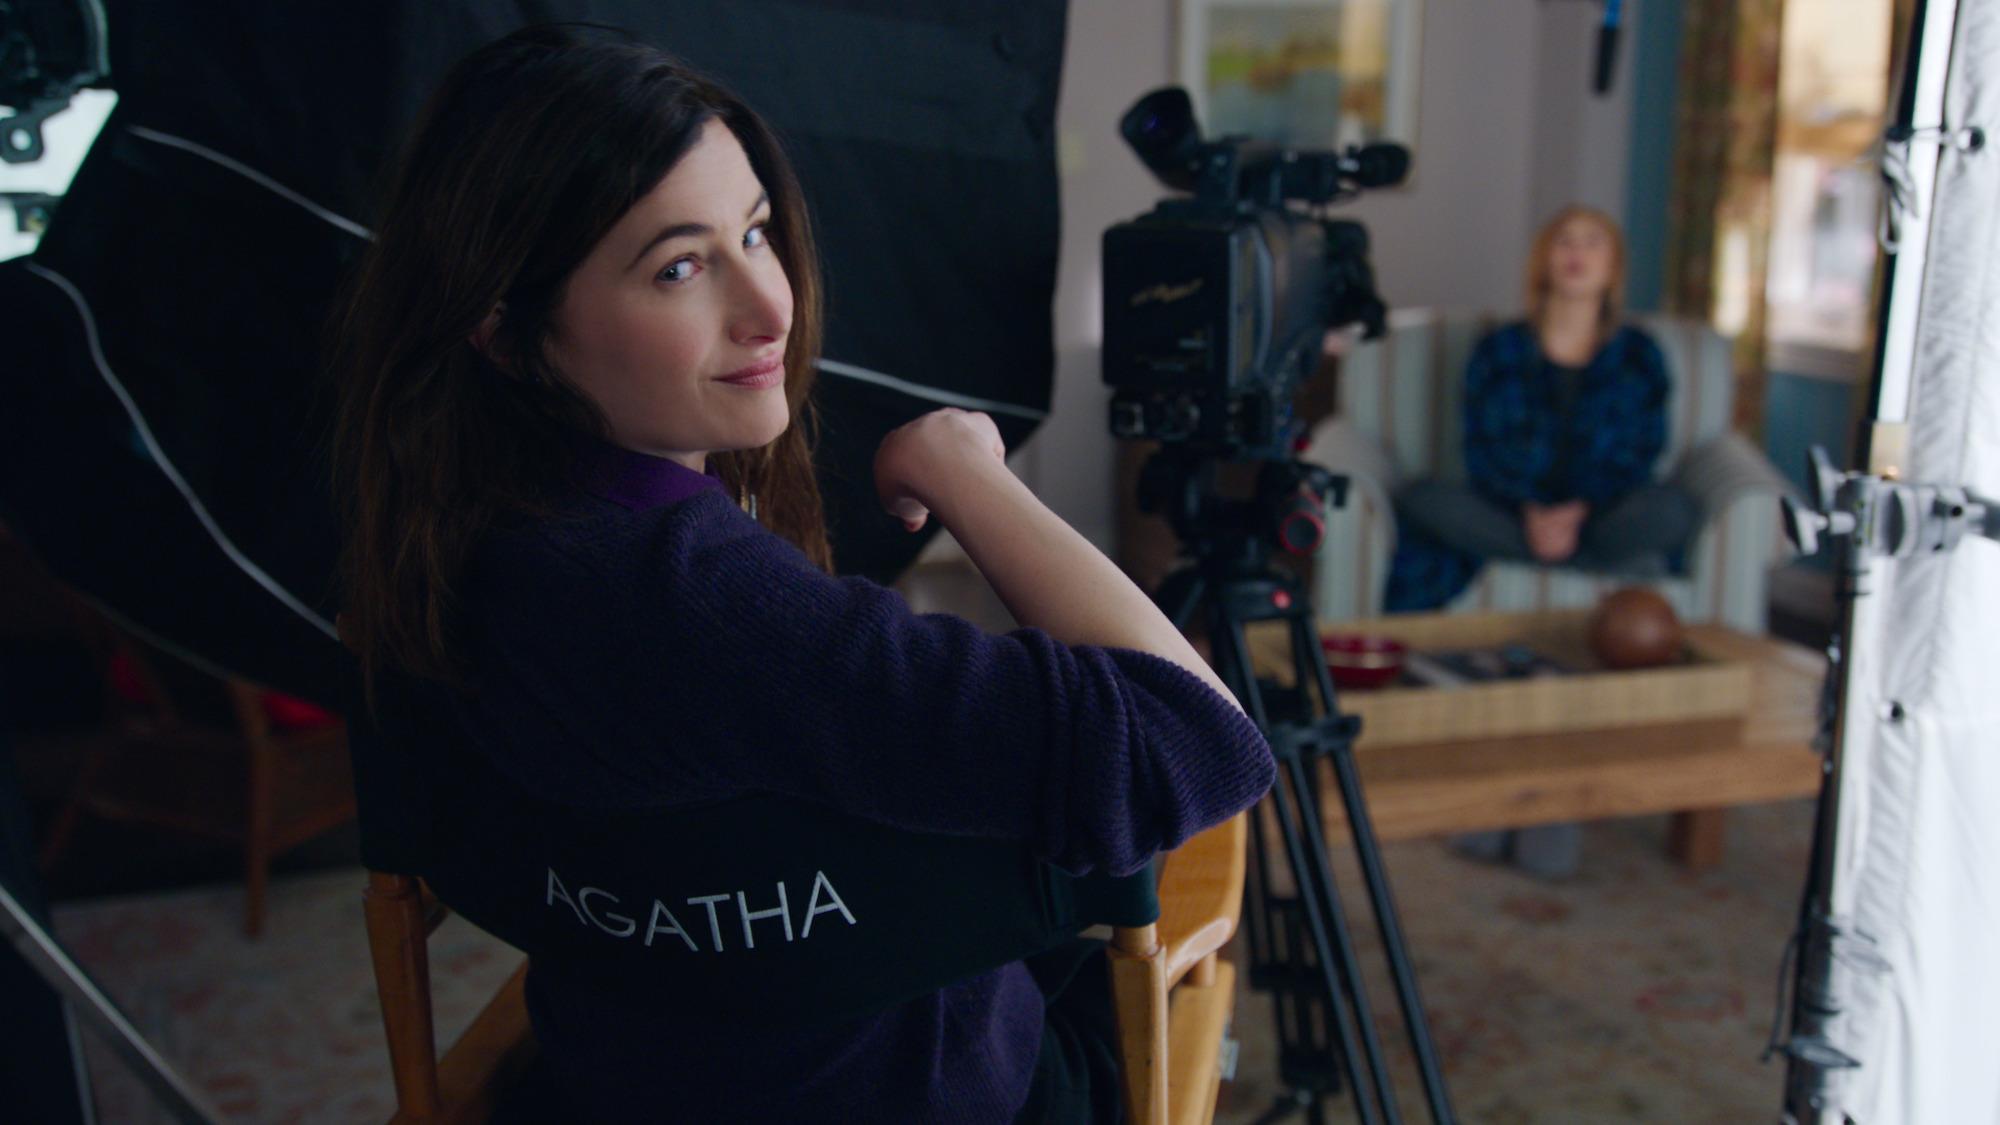 Kathryn Hahn as Agatha Harkness in 'WandaVision'